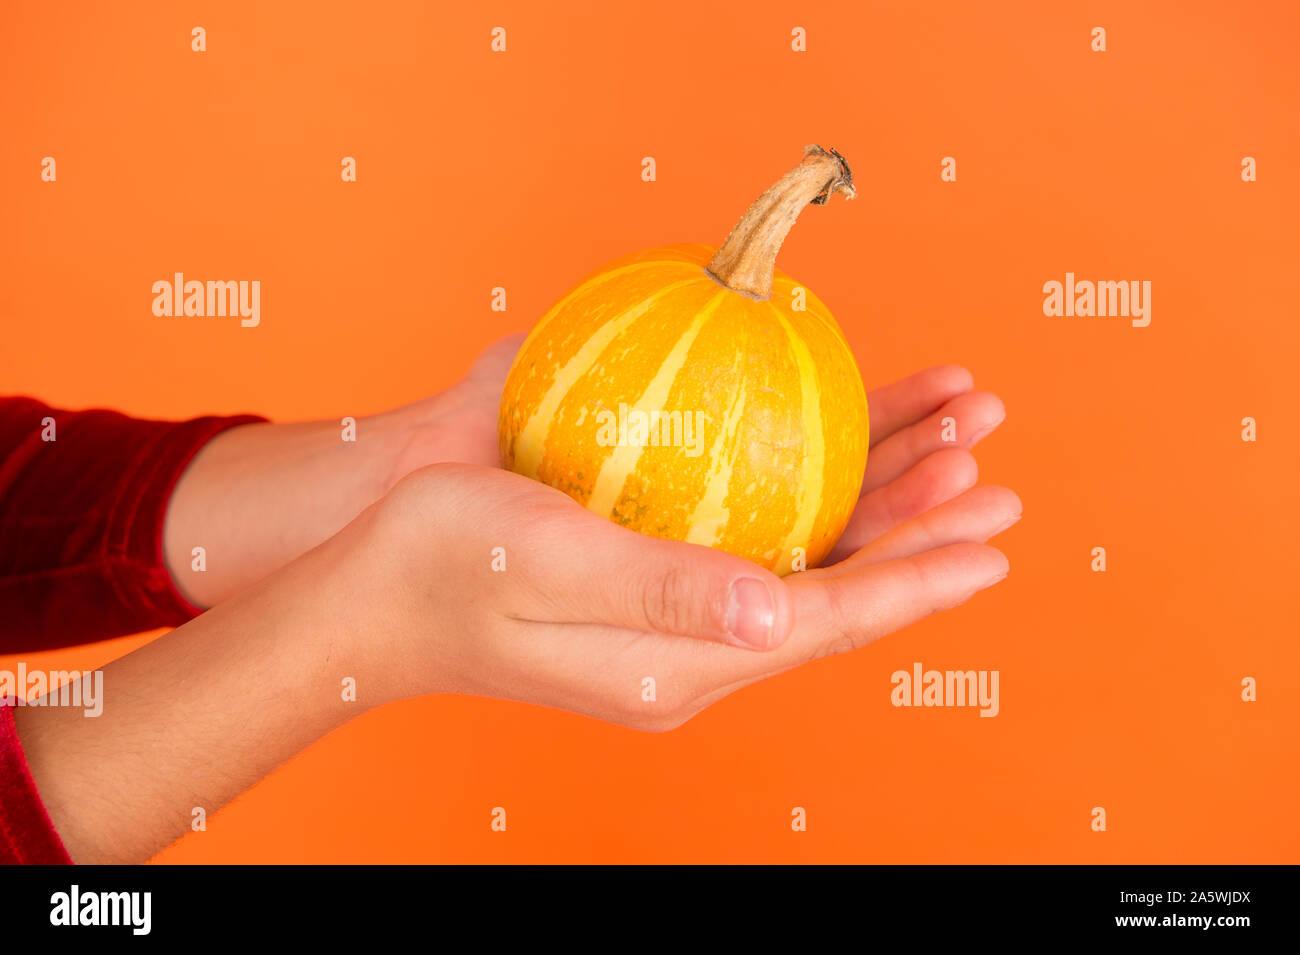 Time To Carve Out The Pumpkin Pumpkin In Hands Orange Background Small Pumpkin Halloween Pumpkin Jack O Lantern Holiday Celebration Stock Photo Alamy